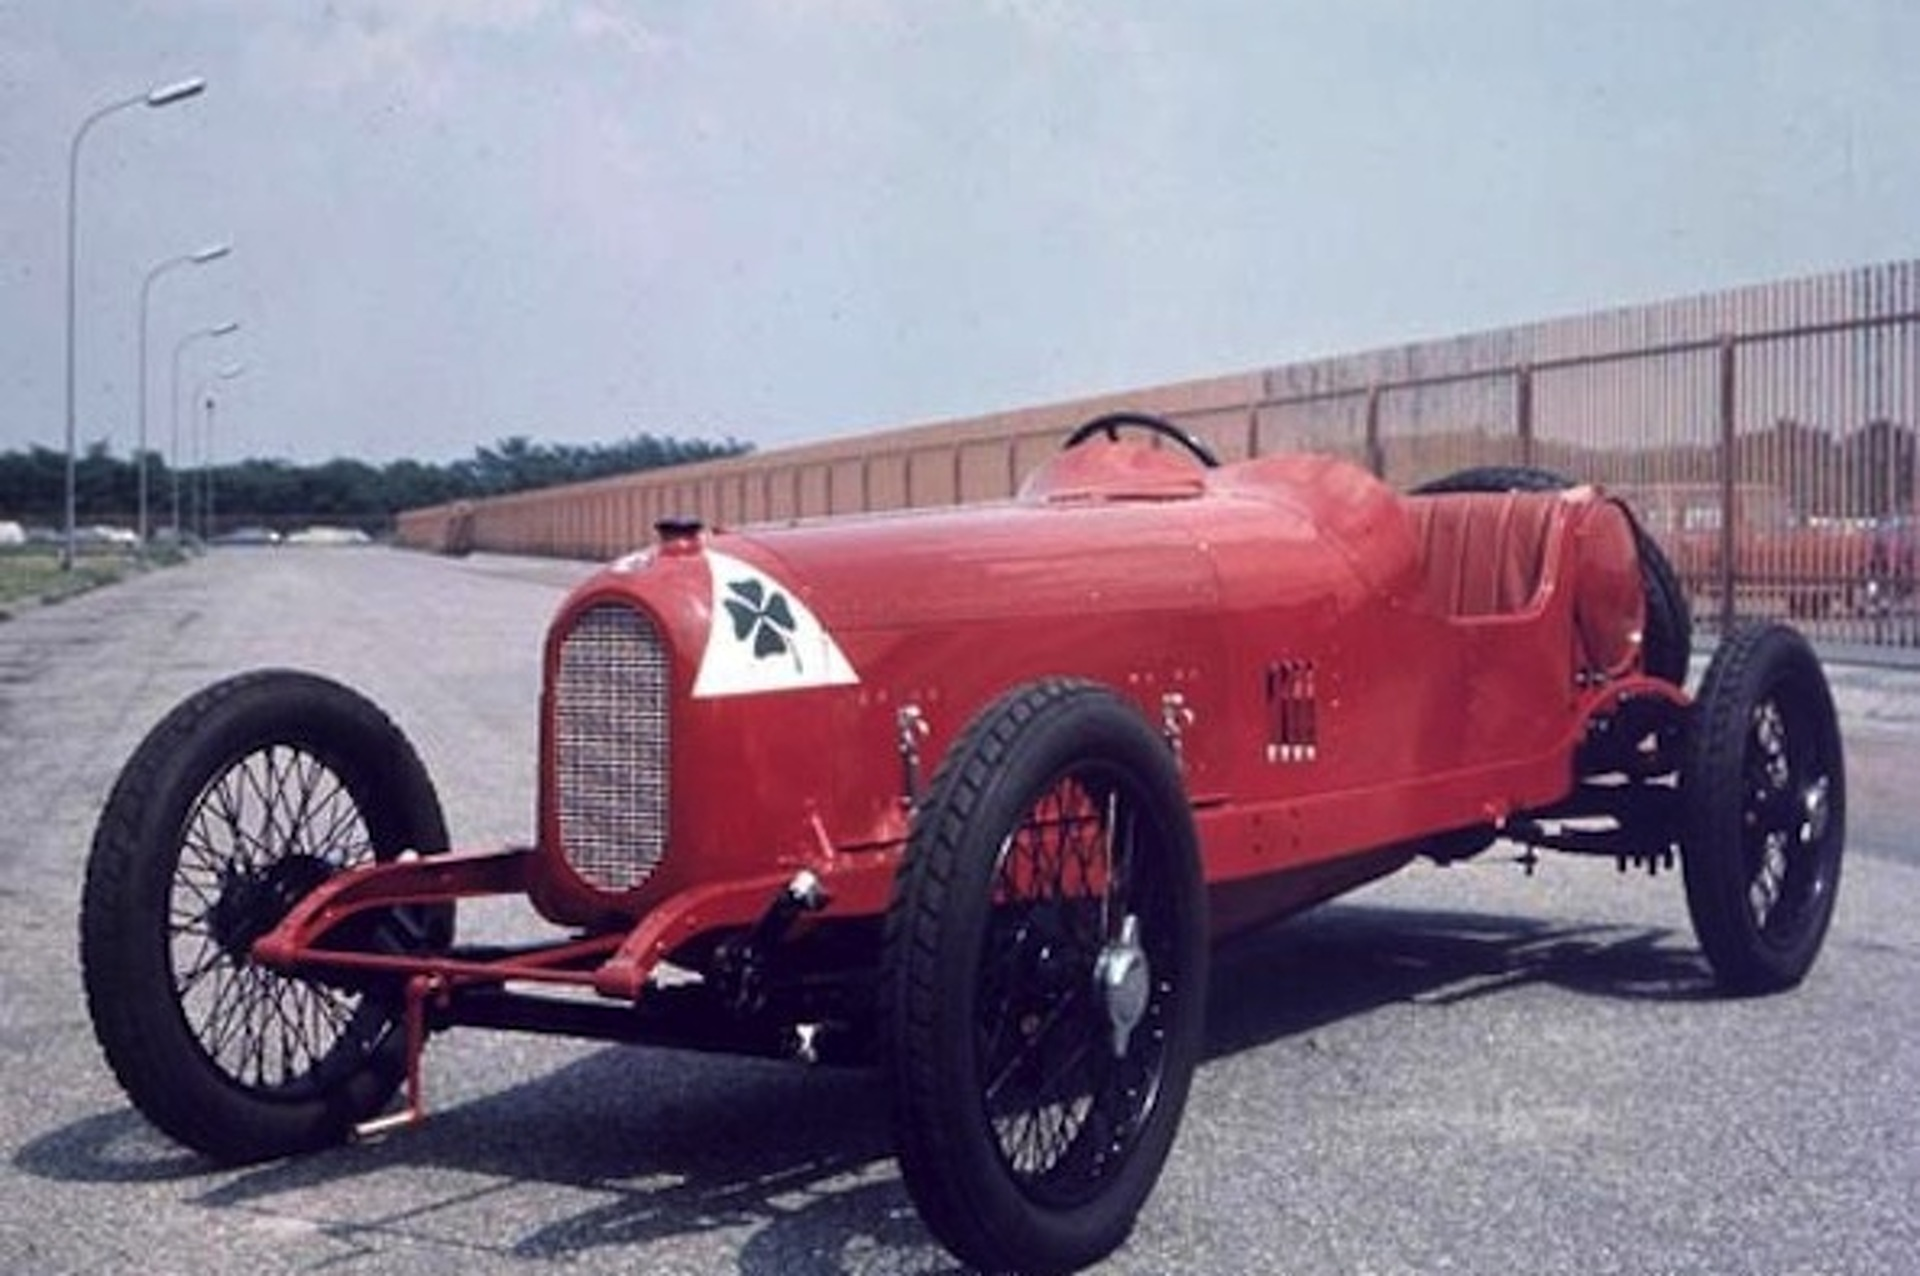 Luck of the Italians: Alfa Romeo and the Story of Quadrifoglio